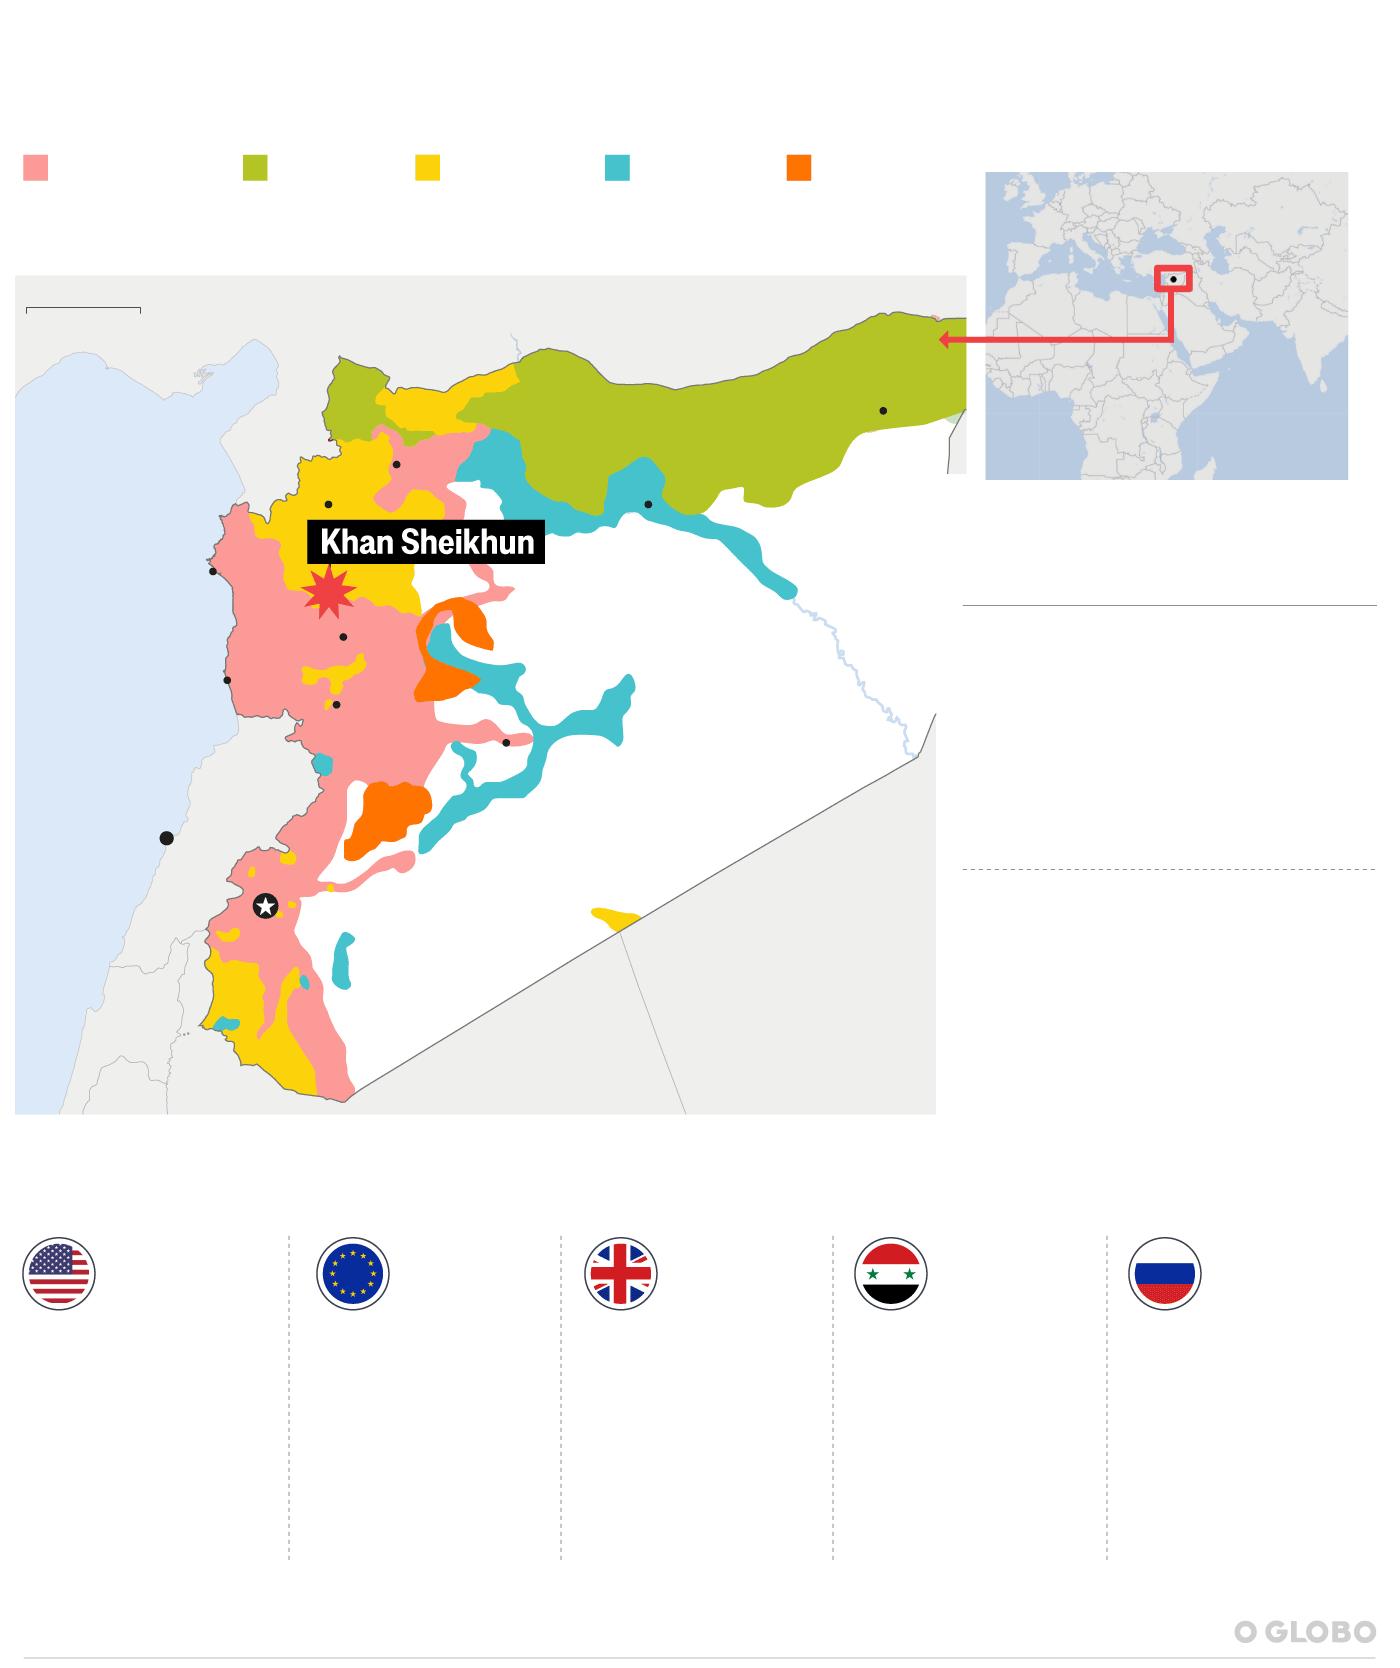 siria-ataque-quimico-reacao-curvas-desk.png